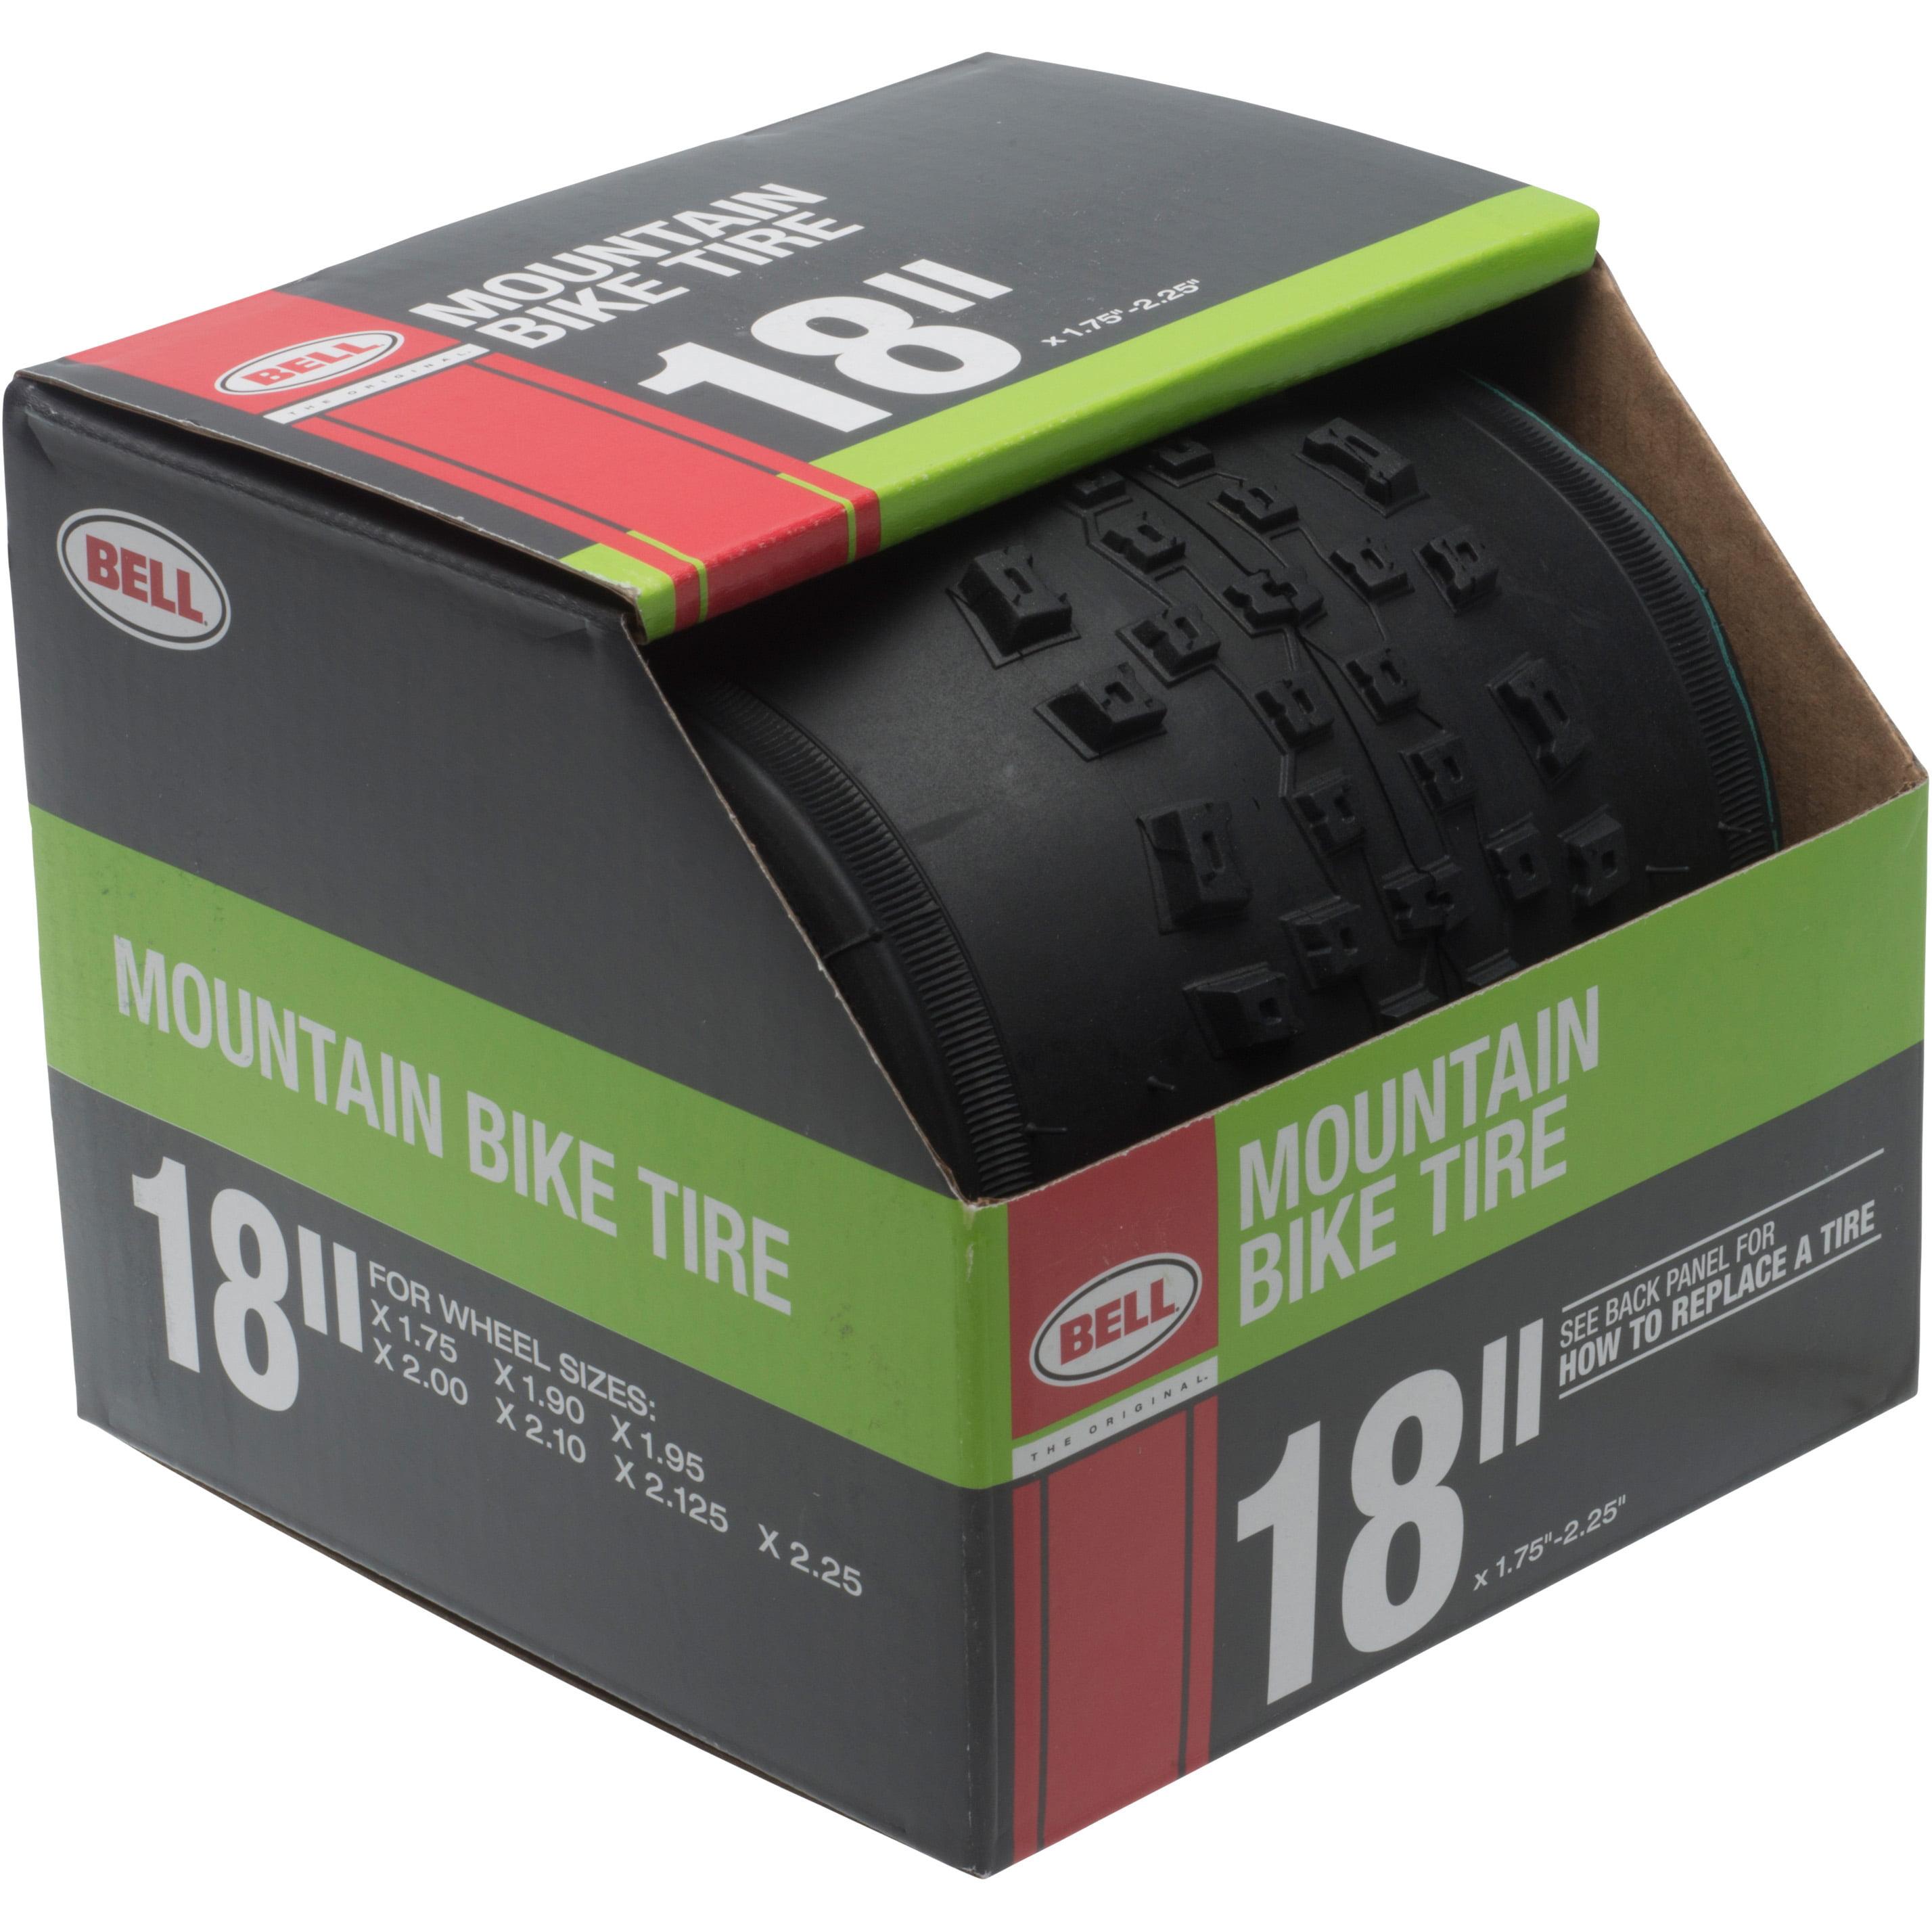 "Bell Sports Standard Mountain Bike Tire, 18"" x 1.75-2.125"", Black"